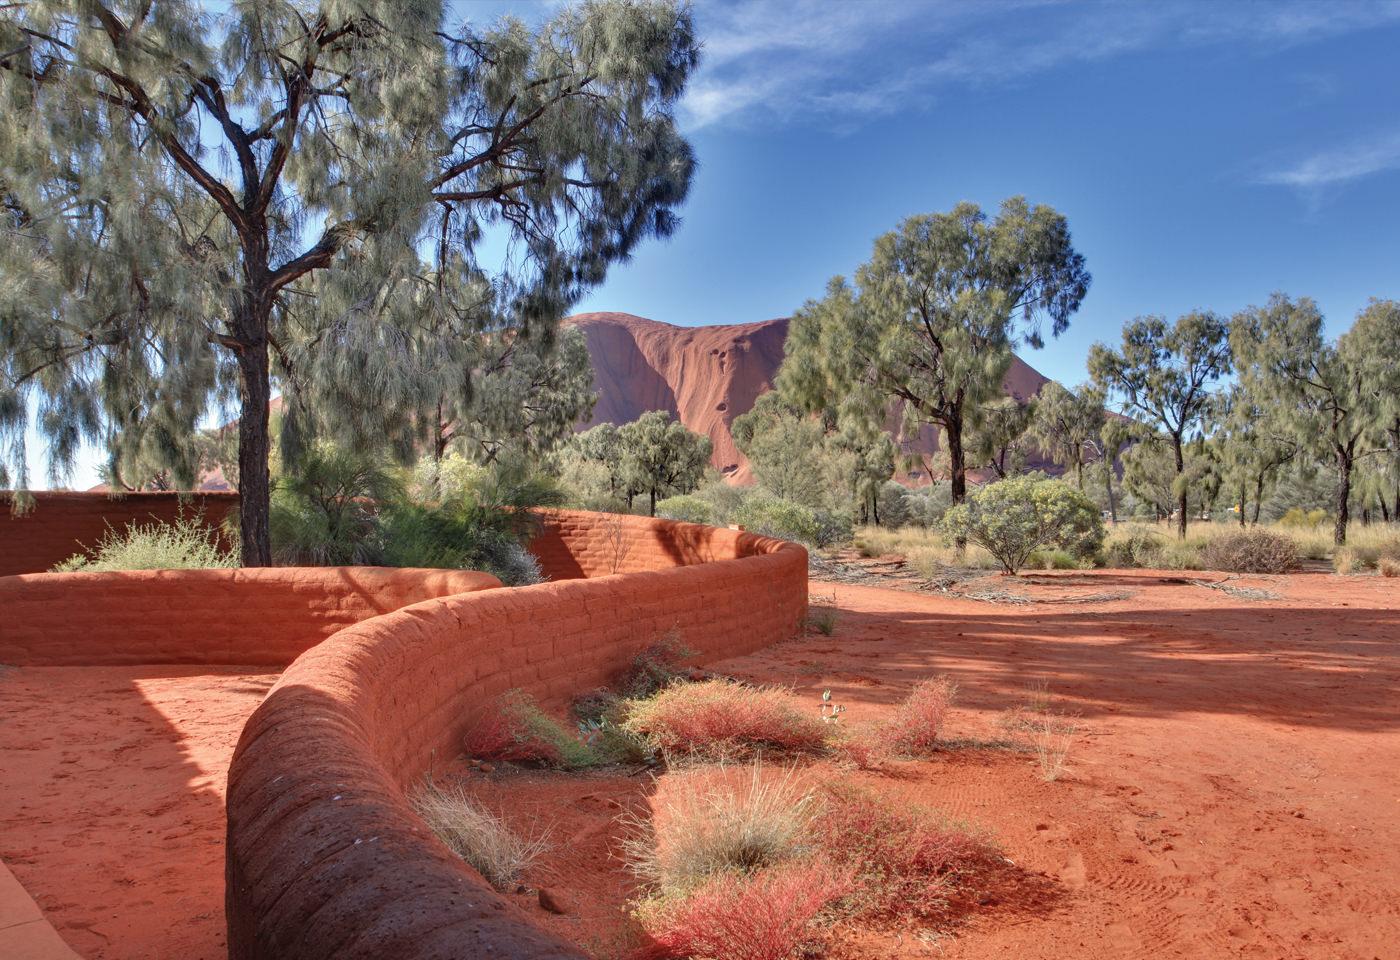 Images Cart : Ayers Rock in Uluru National Park Australia |Uluru Kata Tjuta National Park Australia